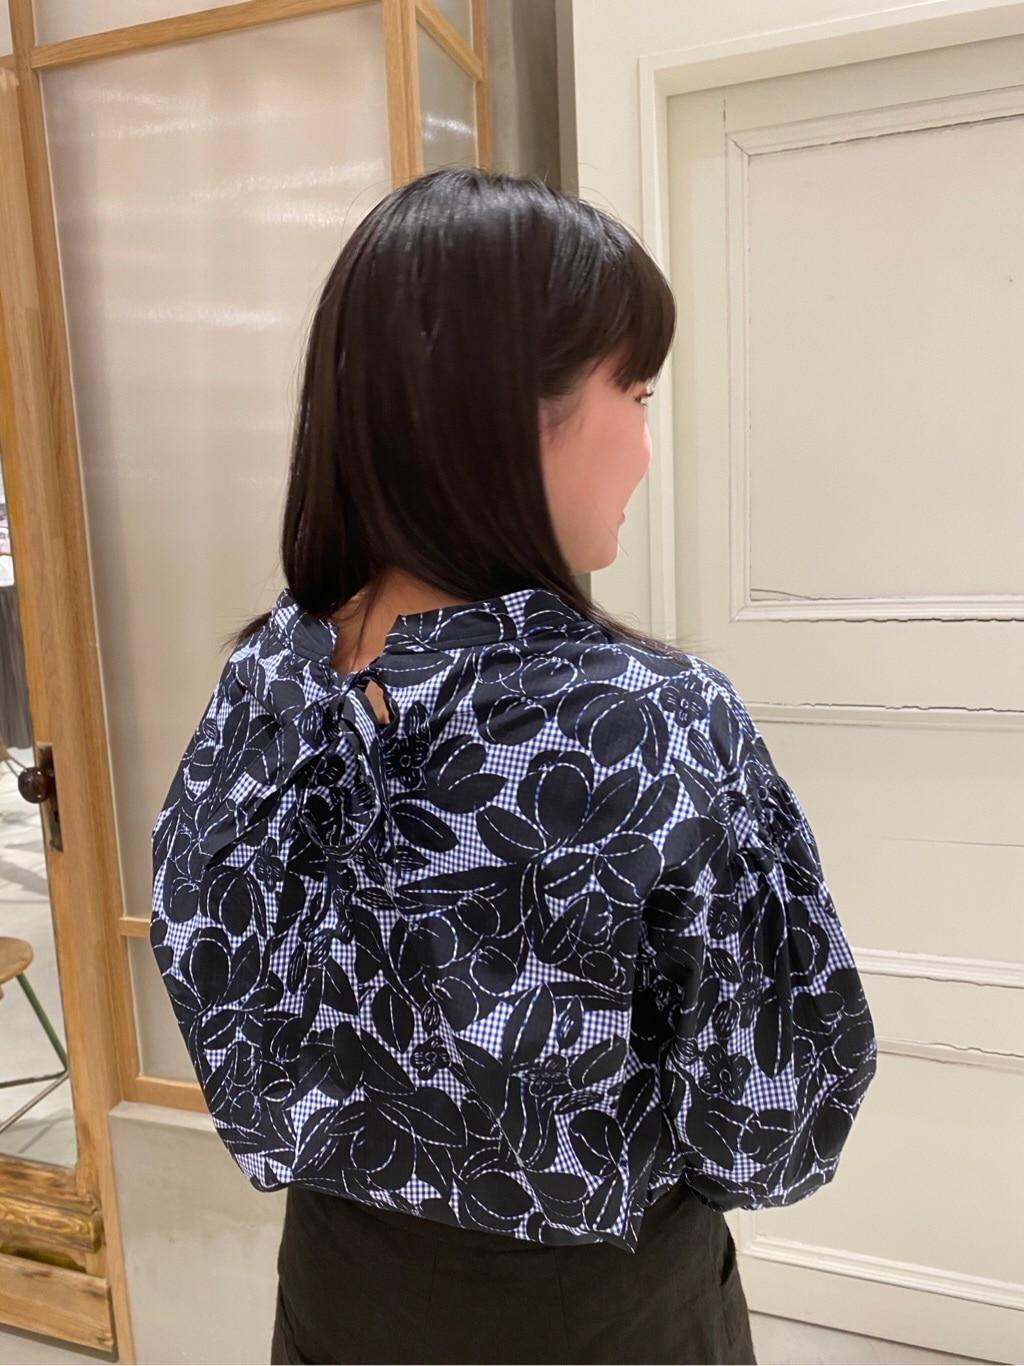 bulle de savon 渋谷スクランブルスクエア 身長:158cm 2021.03.10